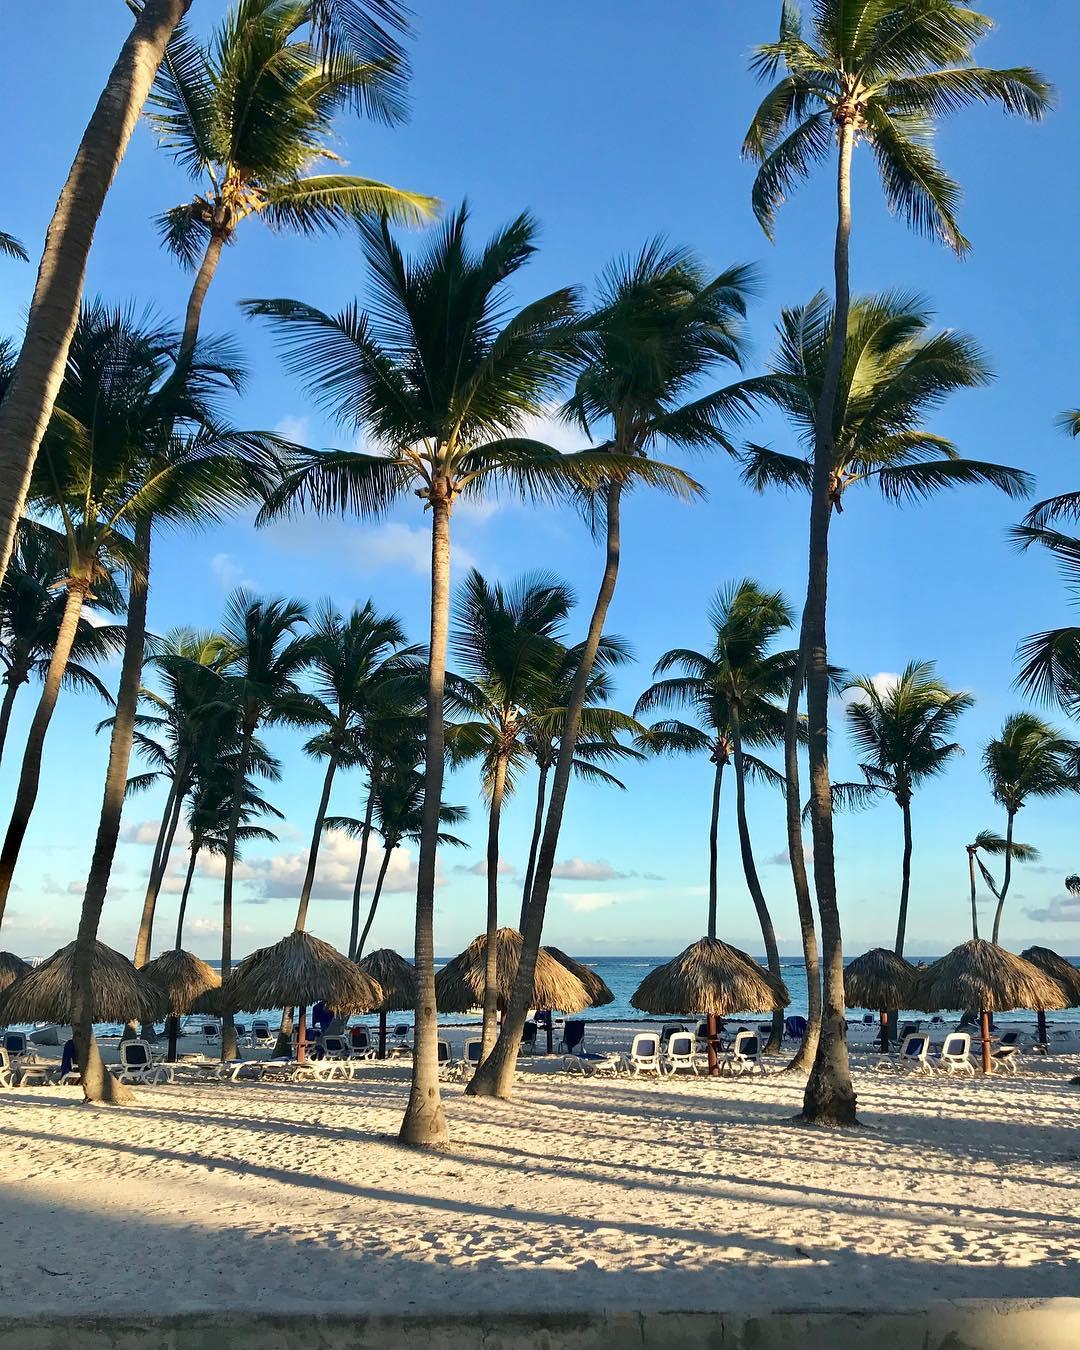 1707fd15f8 All inclusive resort in Punta Cana | All inclusive vacations in the  Dominican Republic